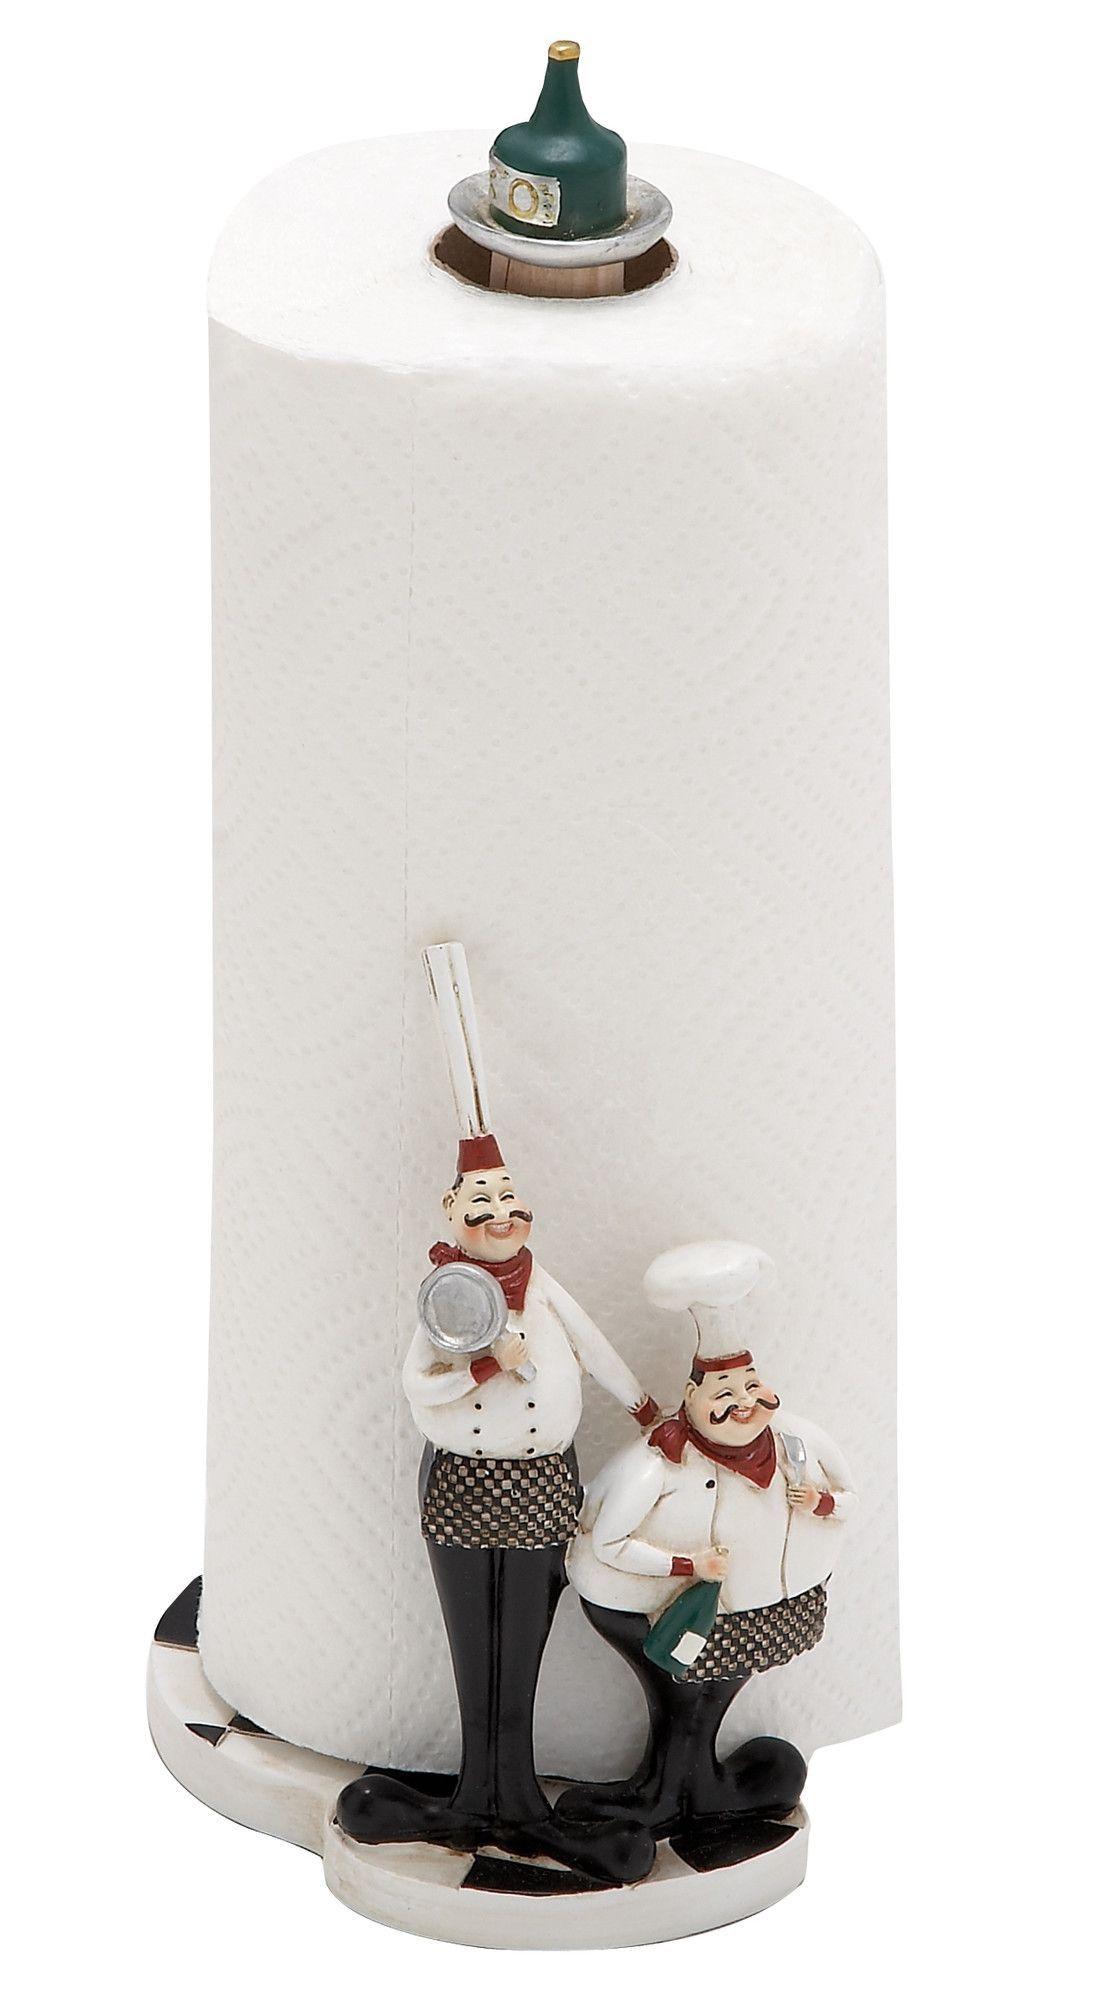 Polystone Chef Figurine | Chef Kitchen Decor | Pinterest | Kitchen ...